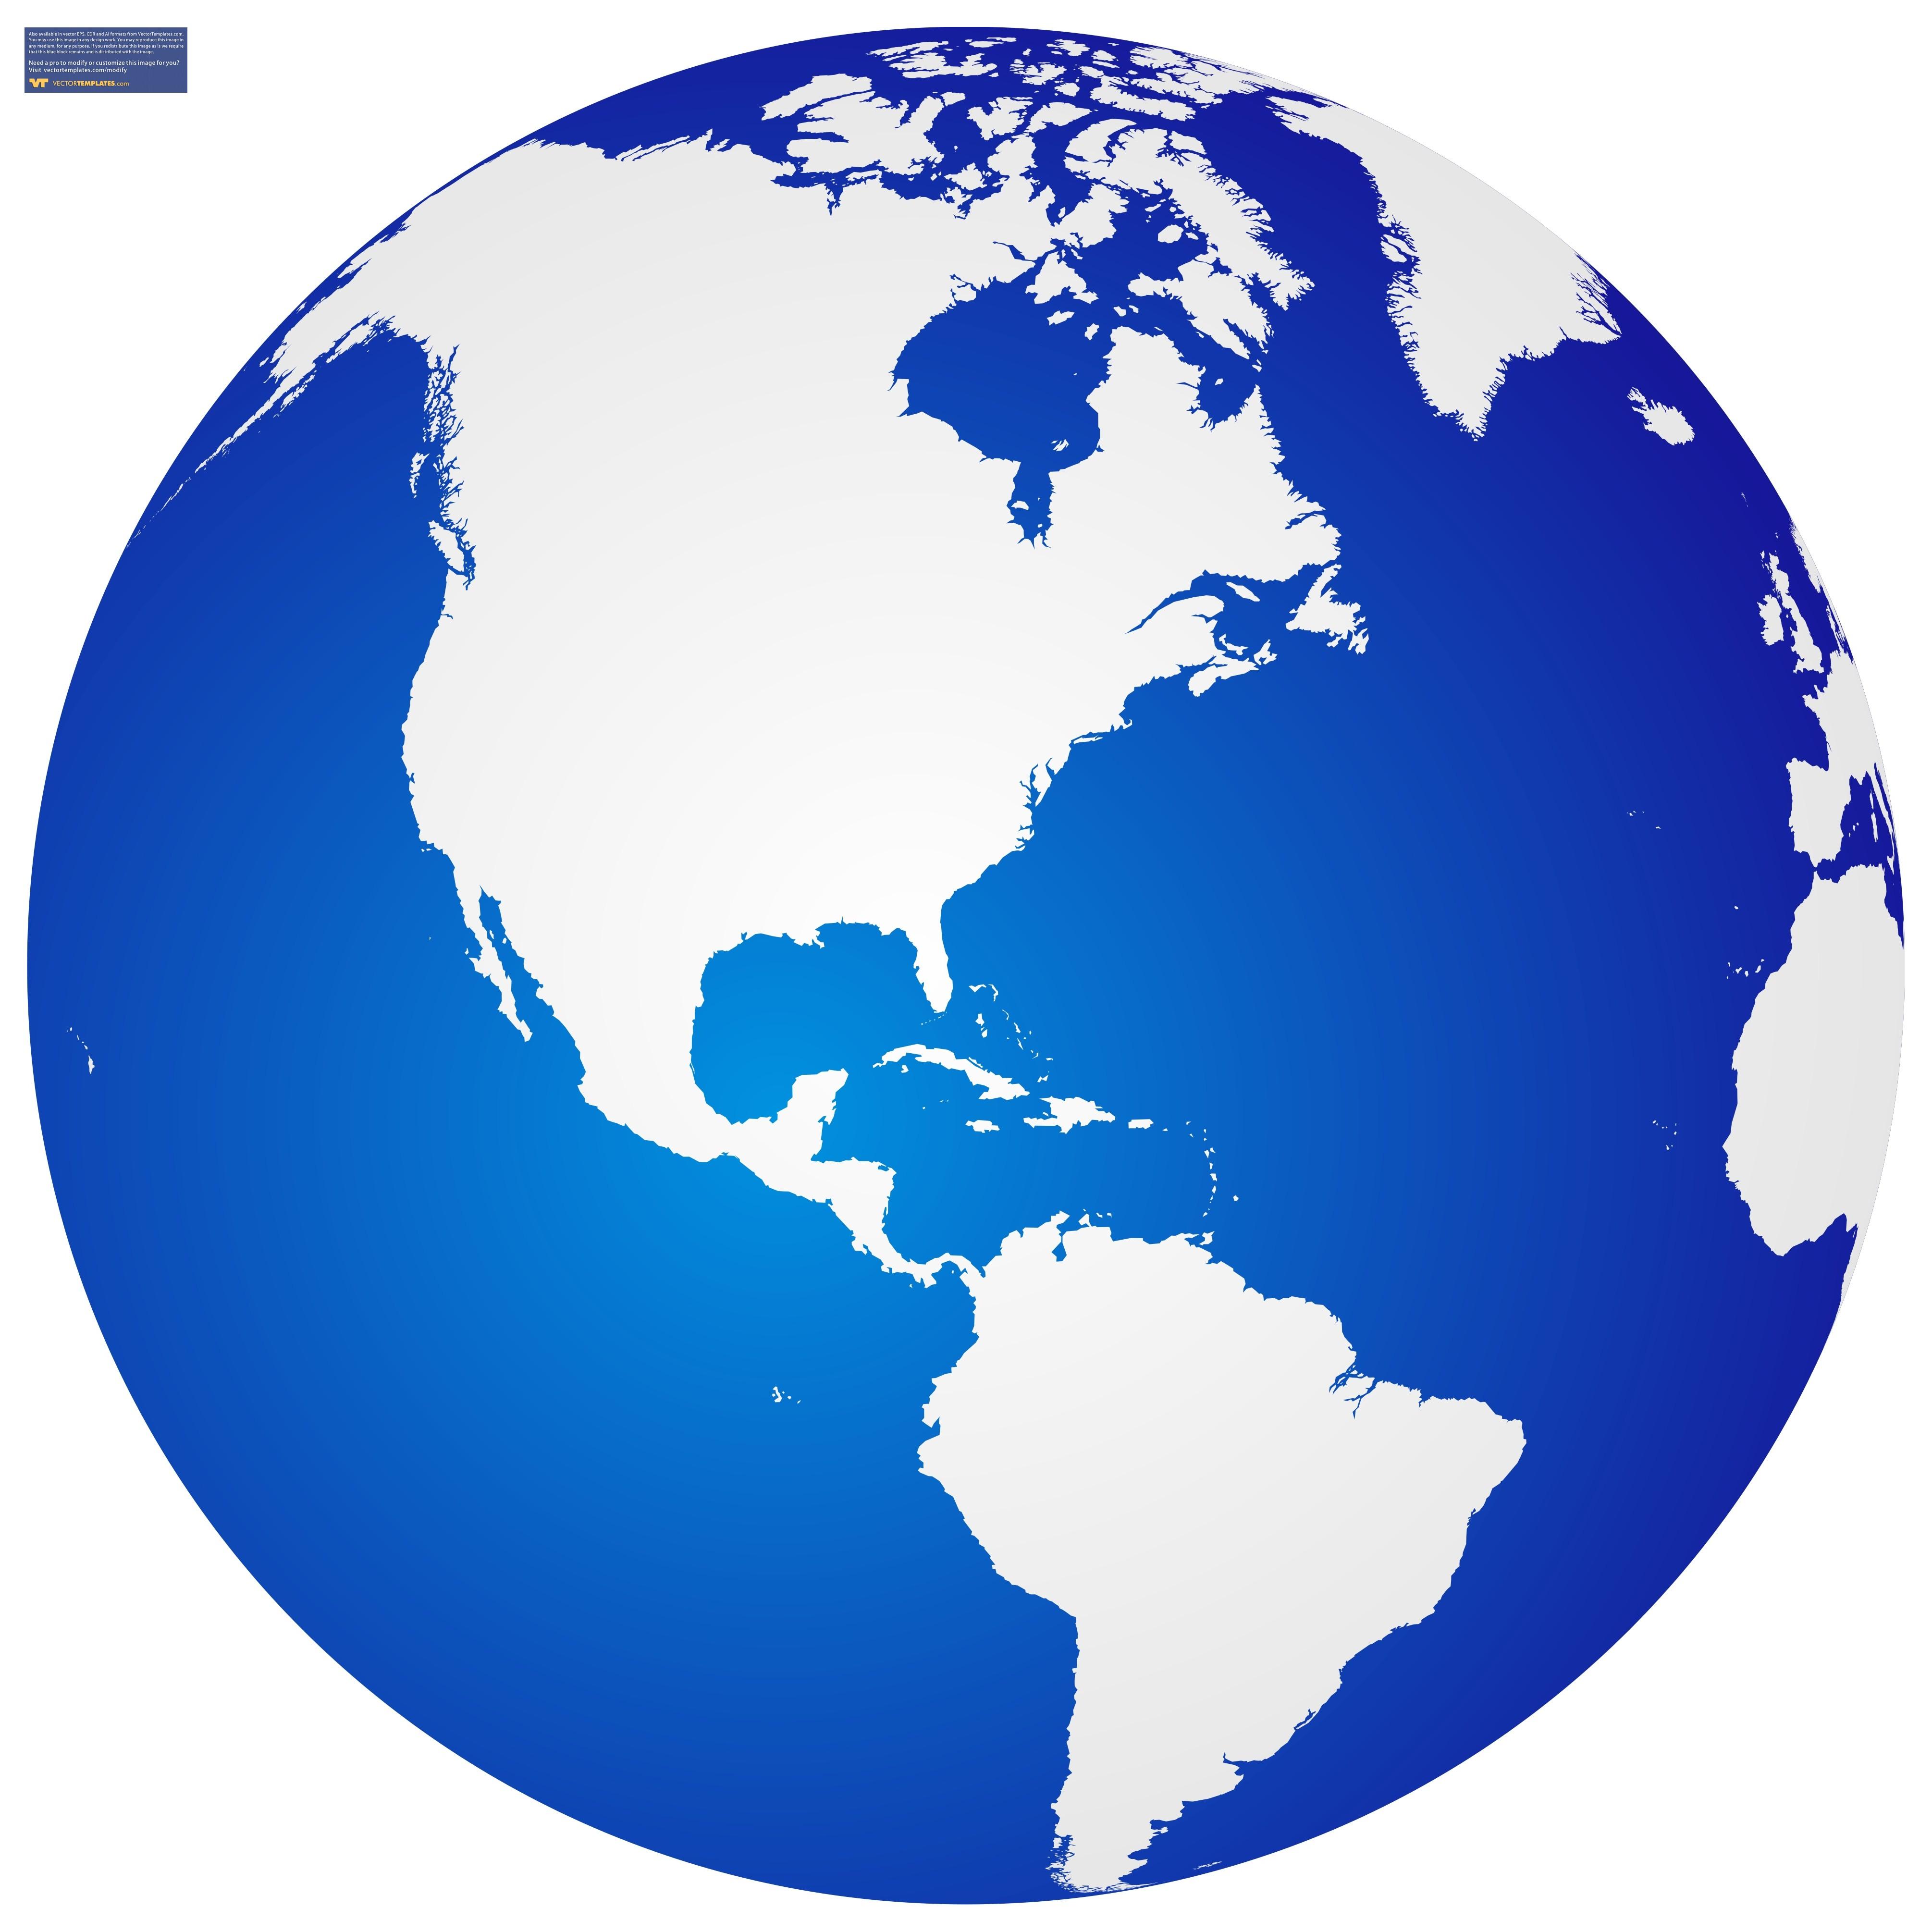 Globe clipart. World free download clip